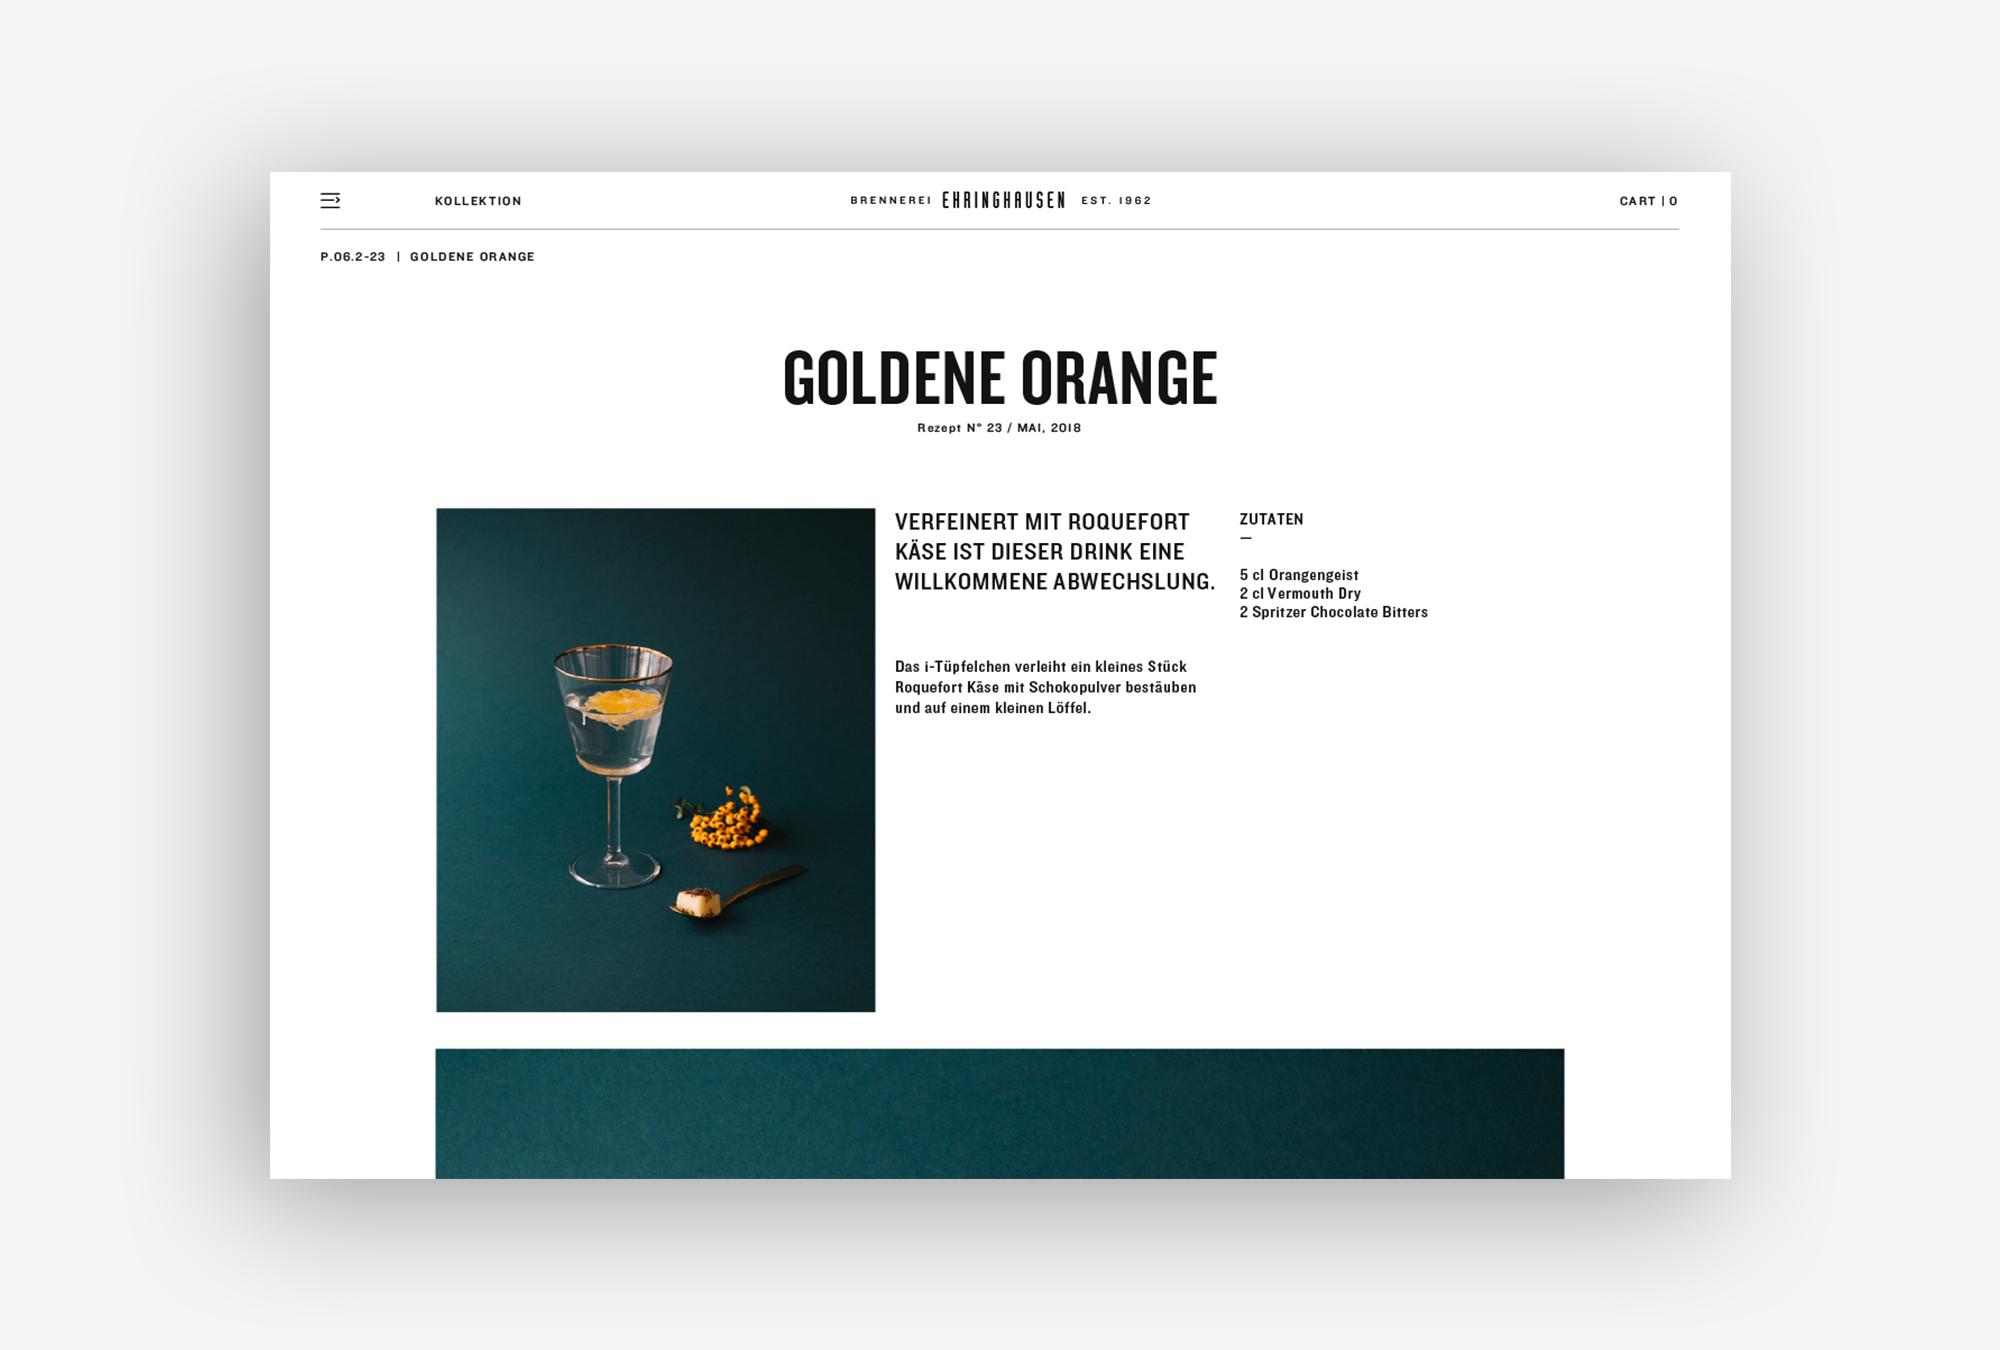 ffine-Portfolio_Brennerei-Ehringhausen_web_07.jpg